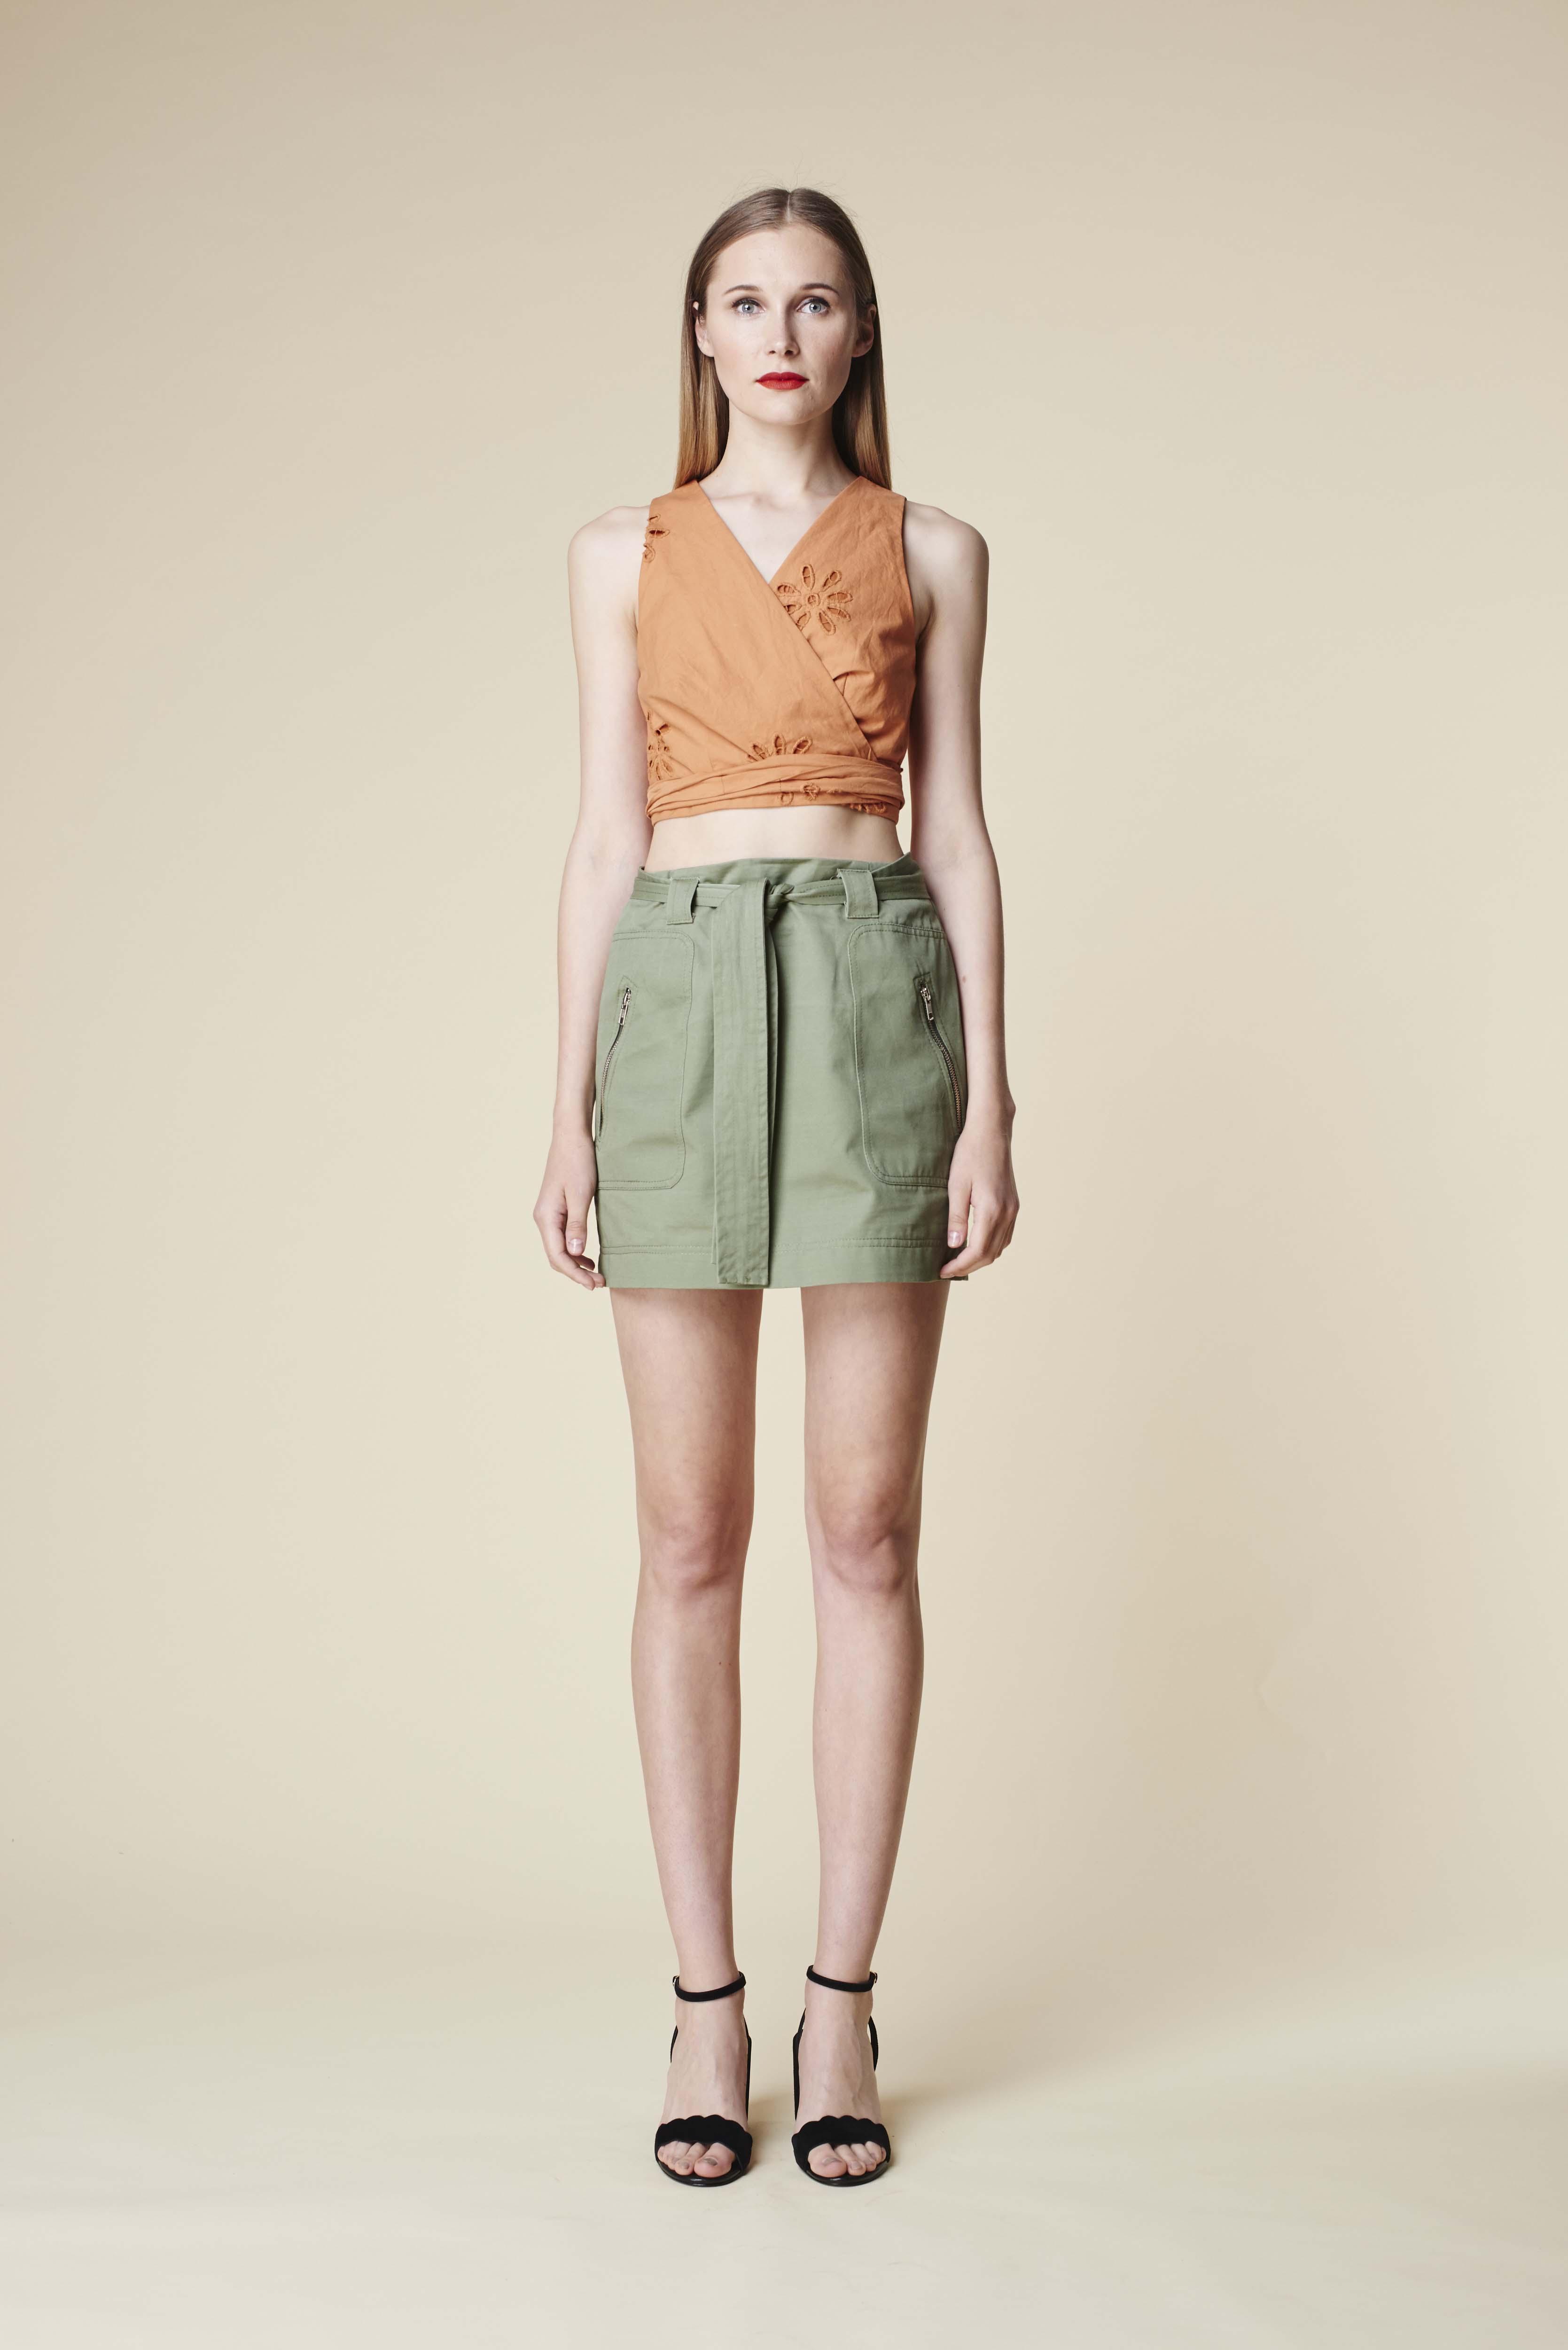 RUBY Aloe Crop Top, Zora Miniskirt & Lila Heel